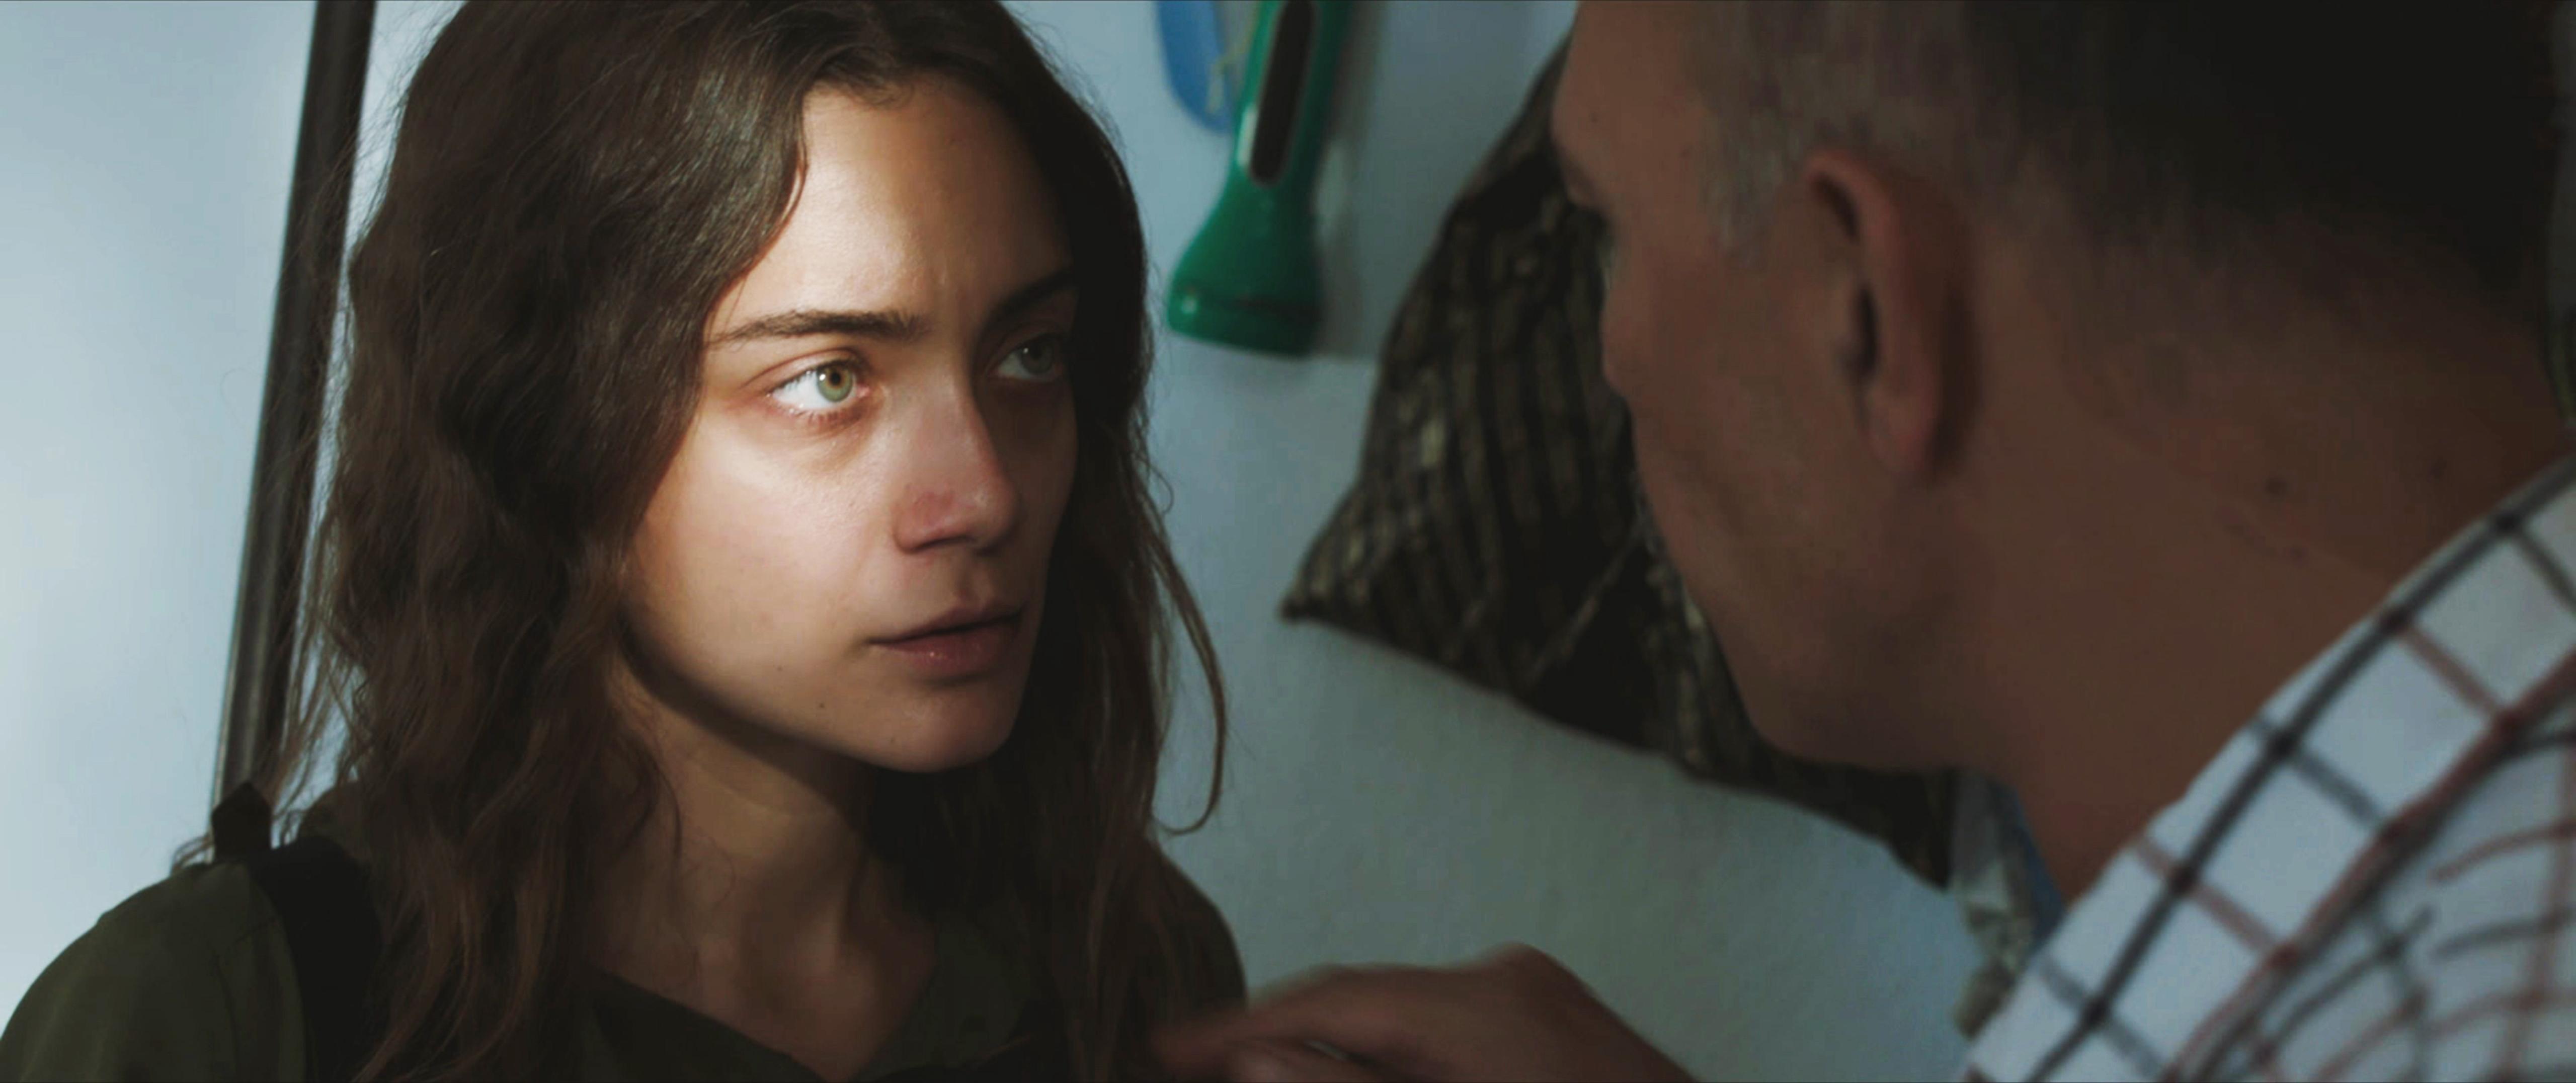 RAMATA TÉLÉCHARGER FILM